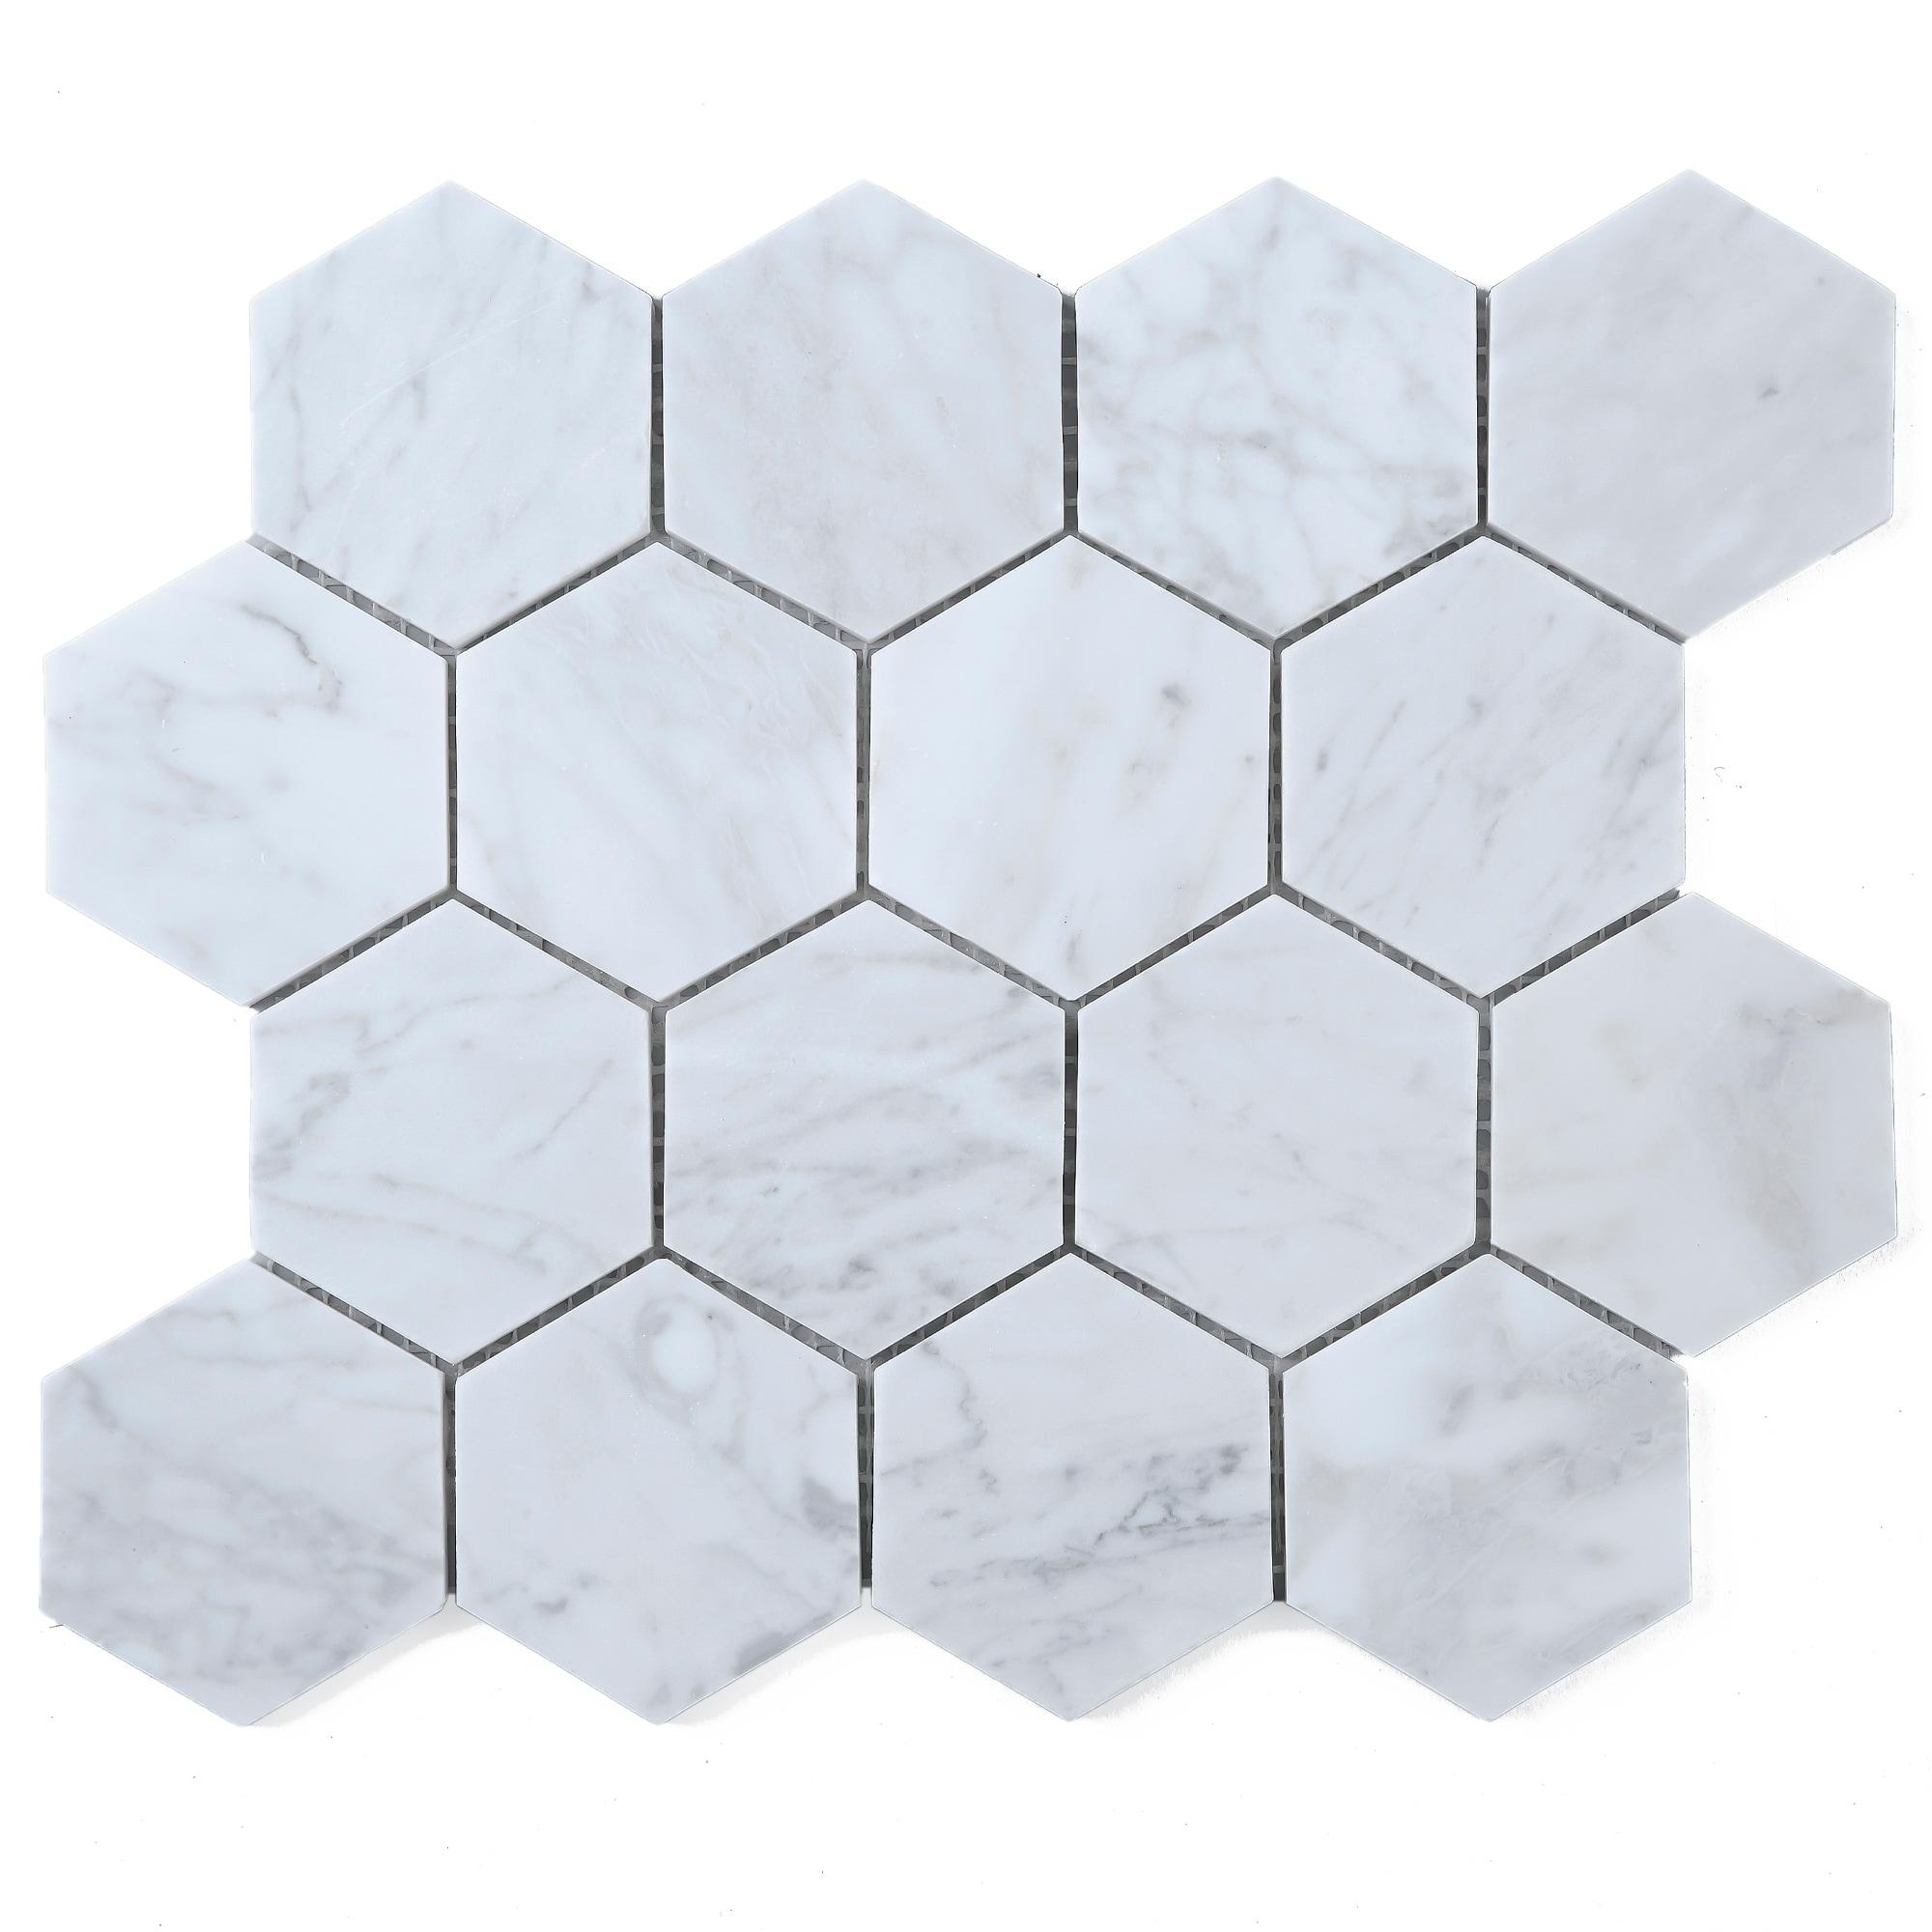 Box of 5 Sheets Chip Size 3x3 Hexagon,12x10-1/2x3/8 CWMM3HEX ...